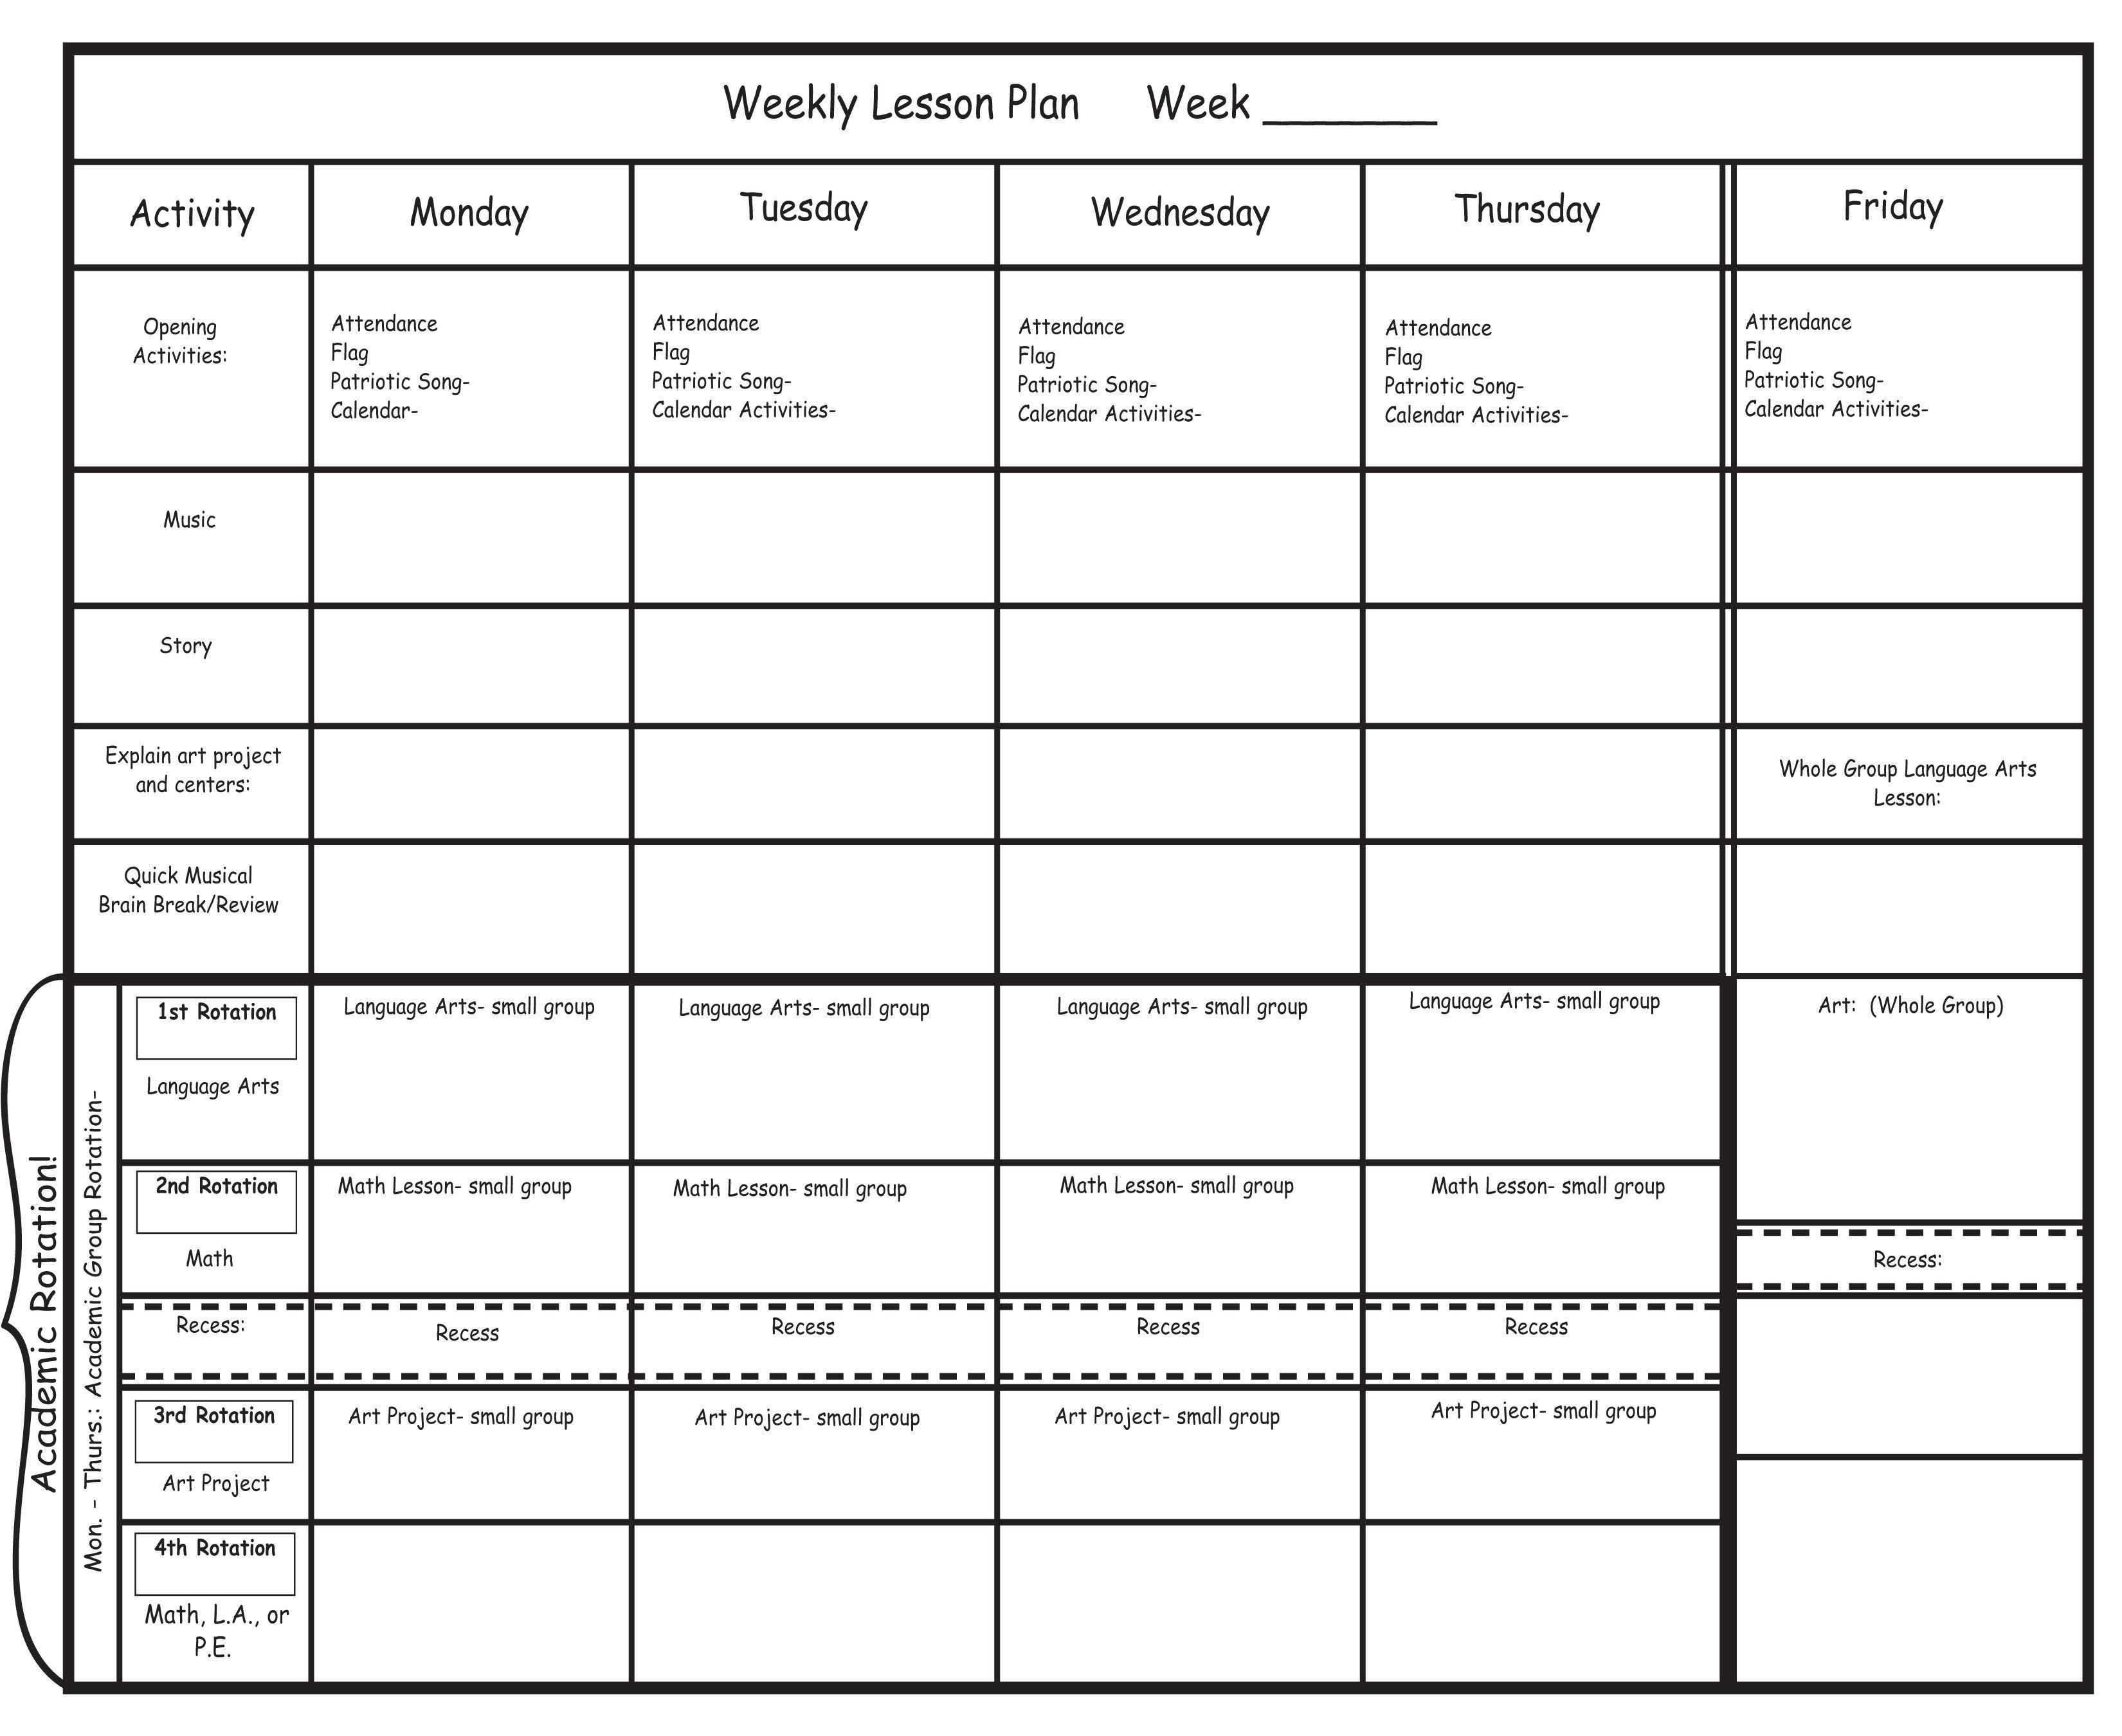 Blank Preschool Lesson Plan Template Kindergarten Lesson Plans Week Two Heidi Songs Llehm